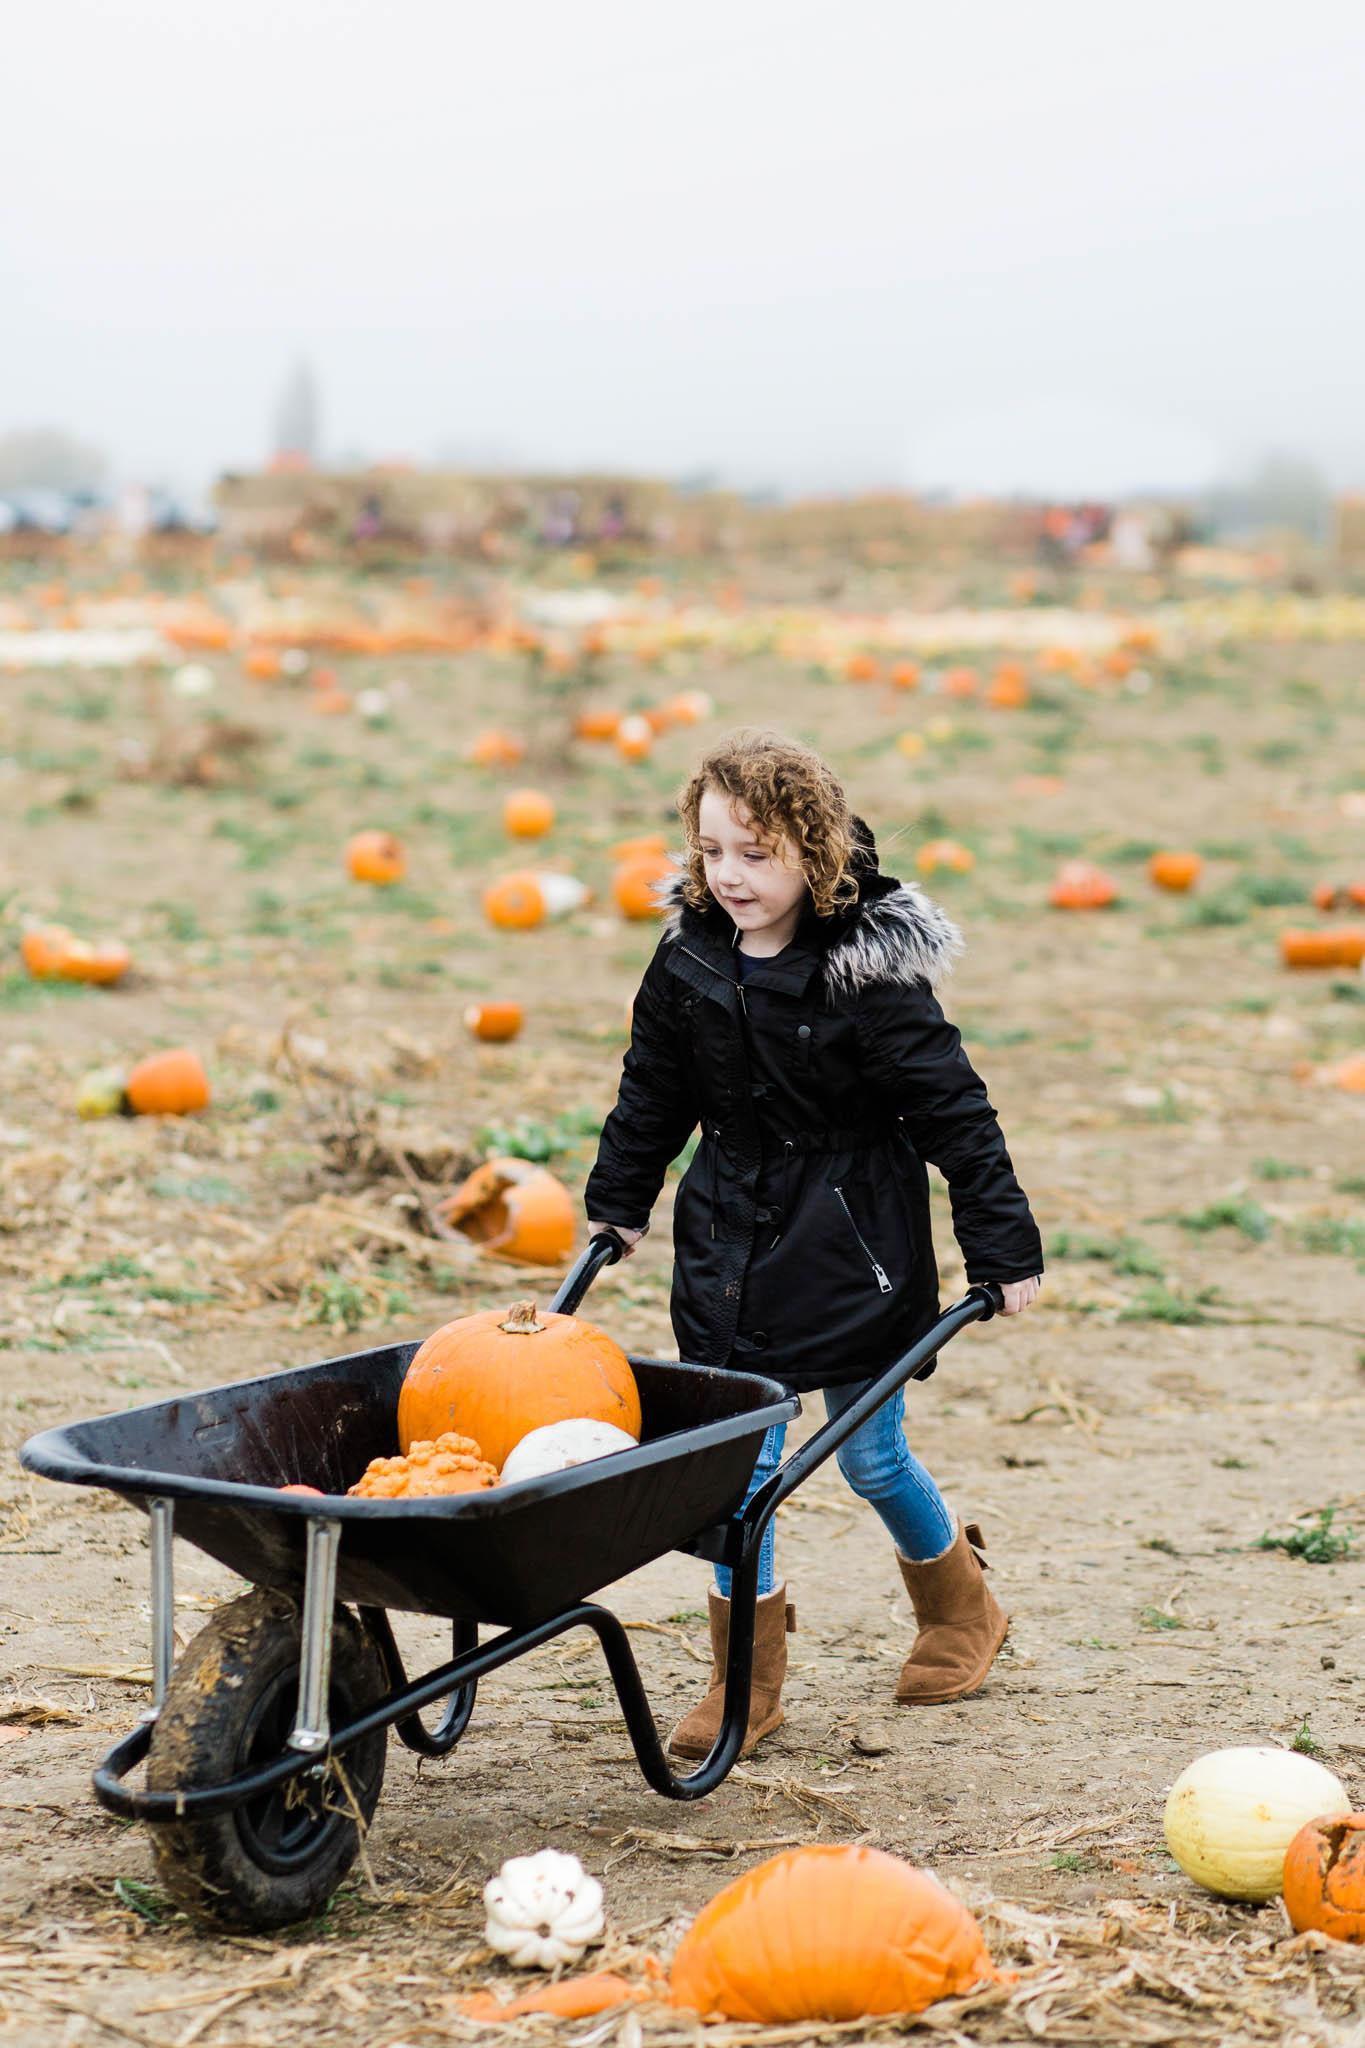 little girl with pumpkins in wheelbarrow